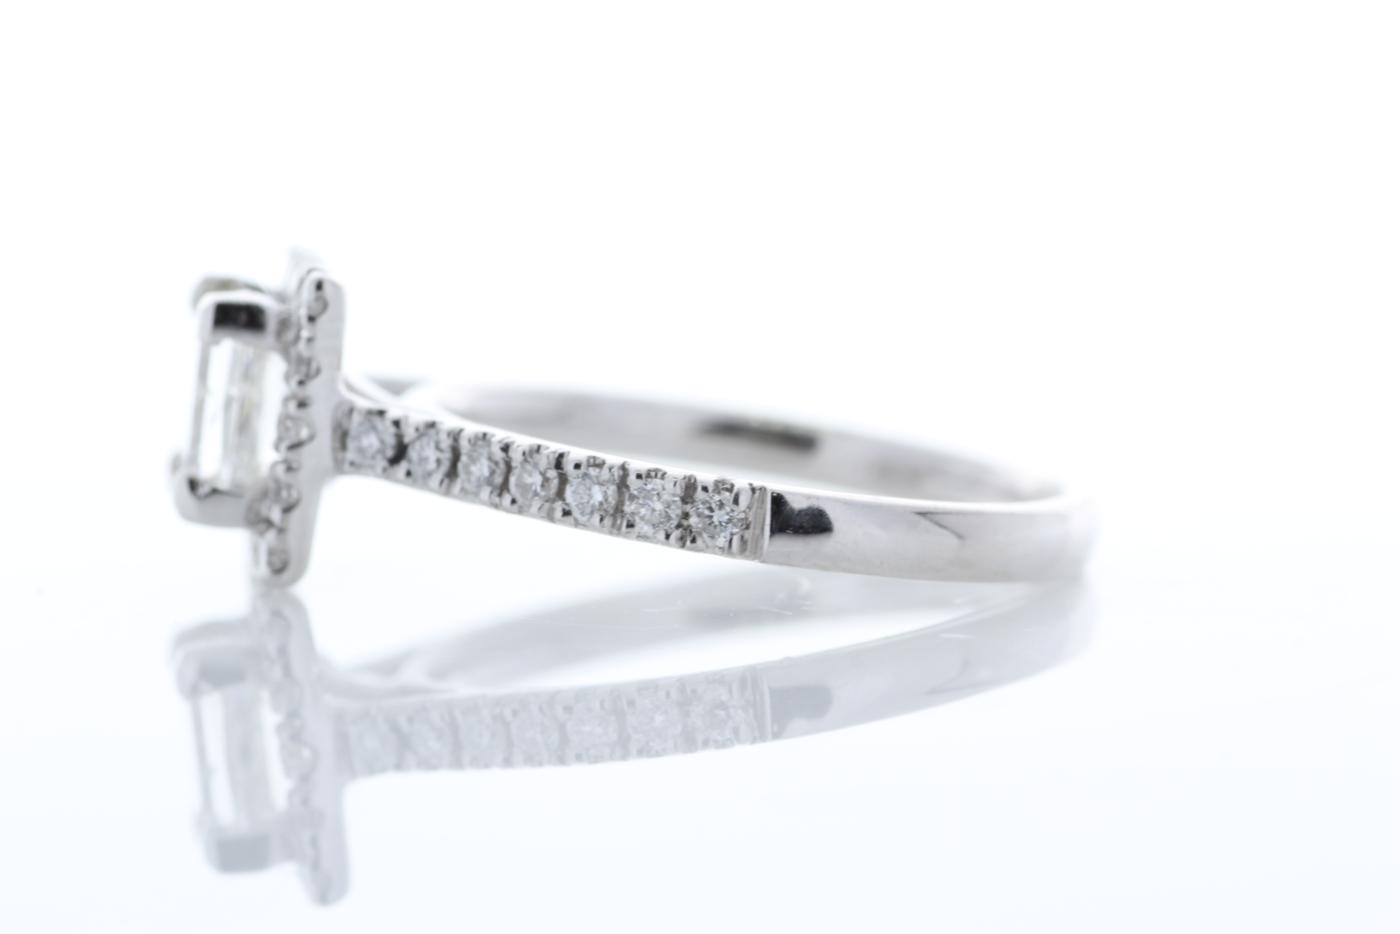 18ct White Gold Halo Set Princess Cut Diamond Ring 1.36 Carats - Image 2 of 6